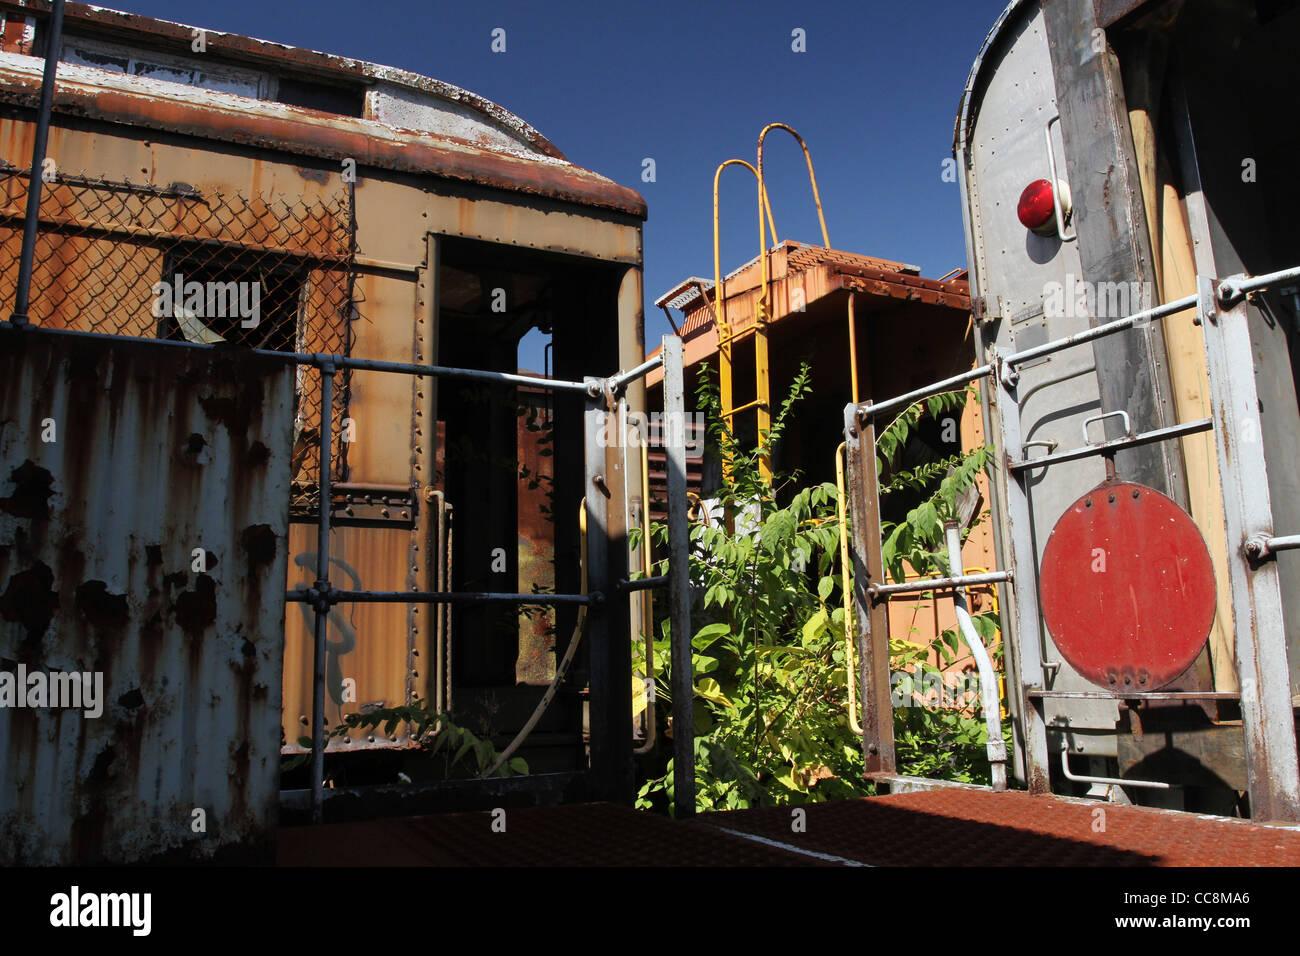 Neglected train cars. The Railway Museum of Greater Cincinnati, Covington, Kentucky, USA. - Stock Image